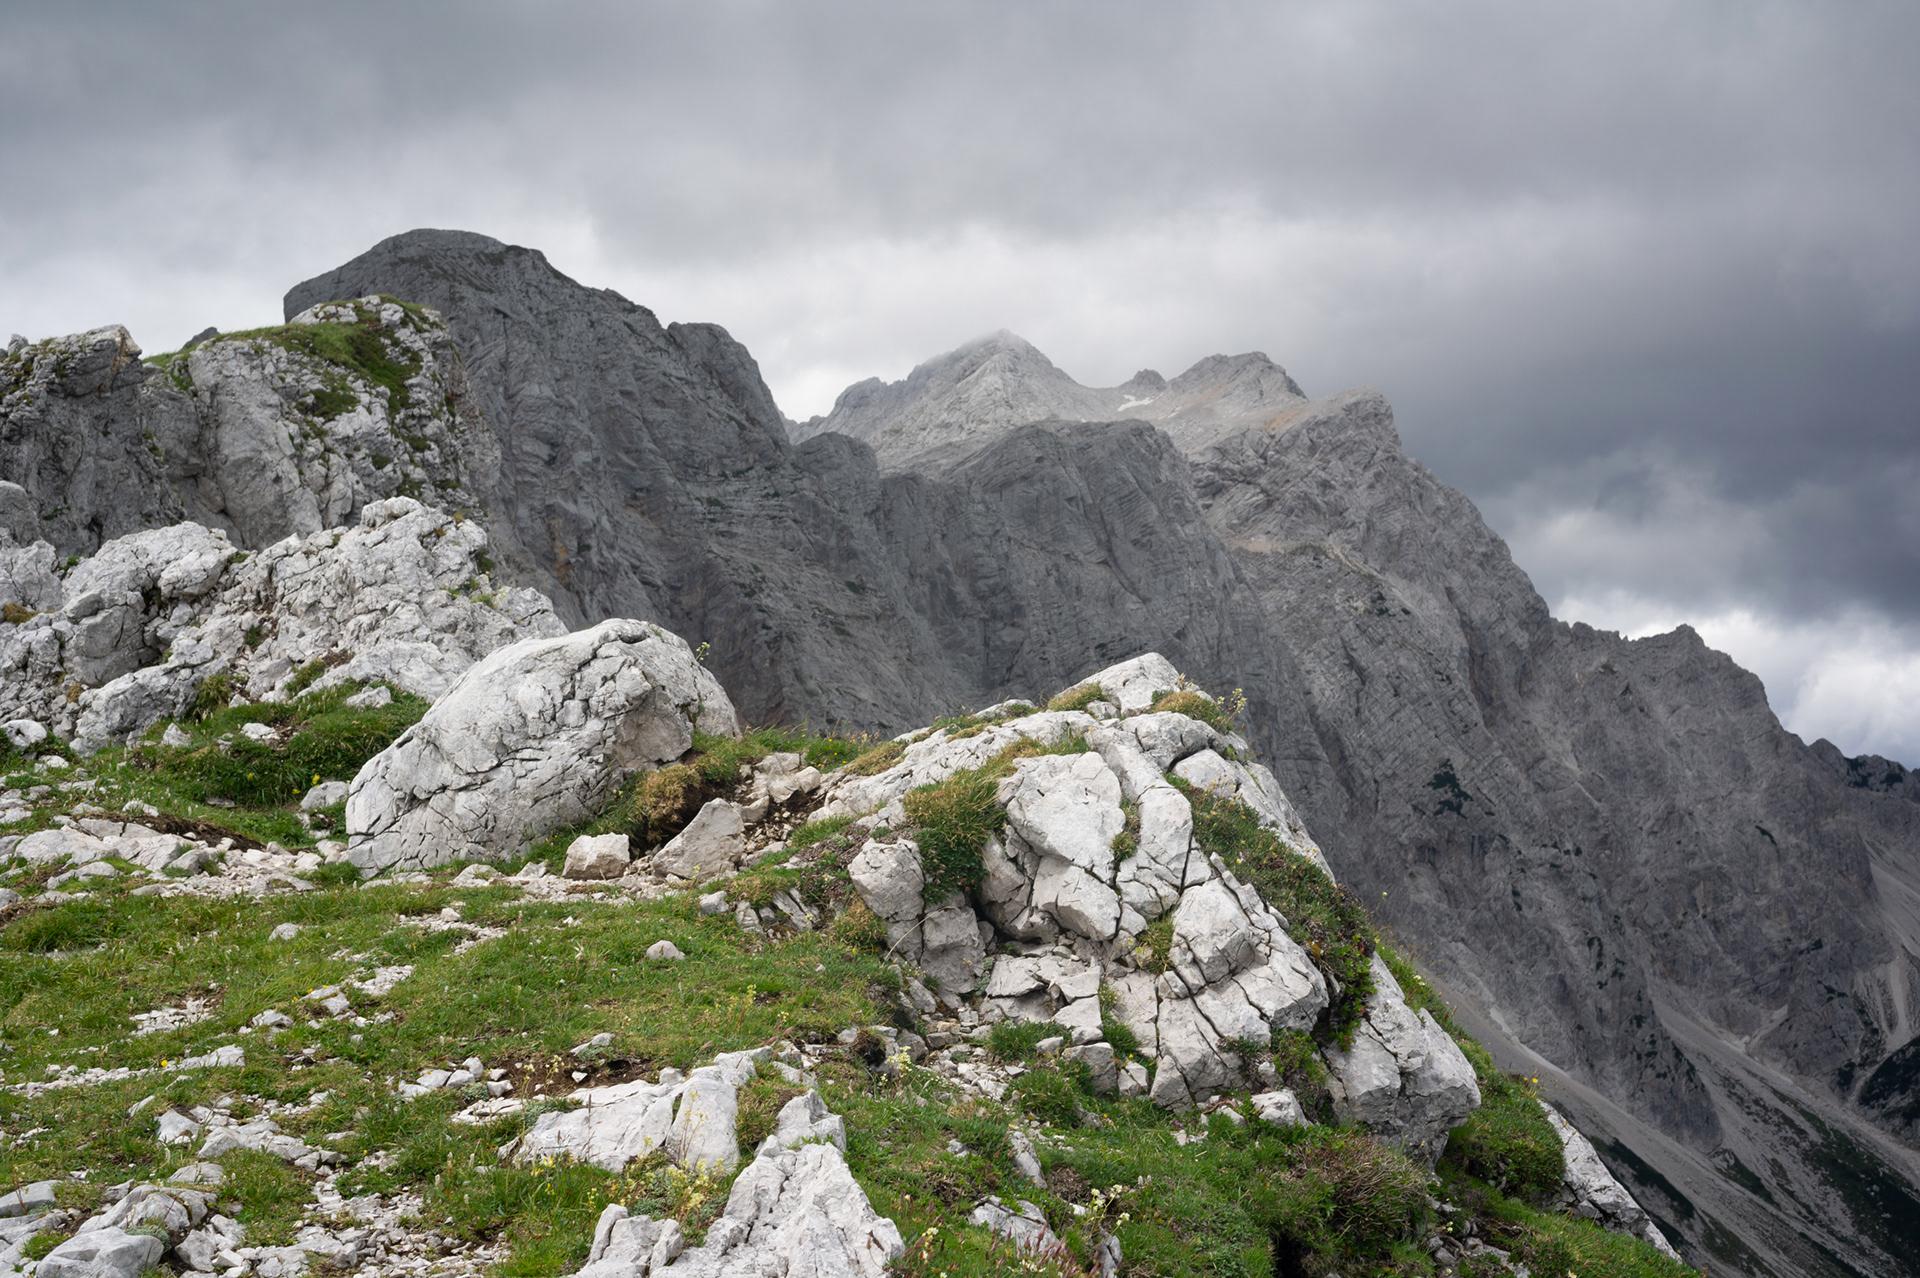 Landscape photography of mountains, Kamnik Saddle, Karavanks, Slovenia